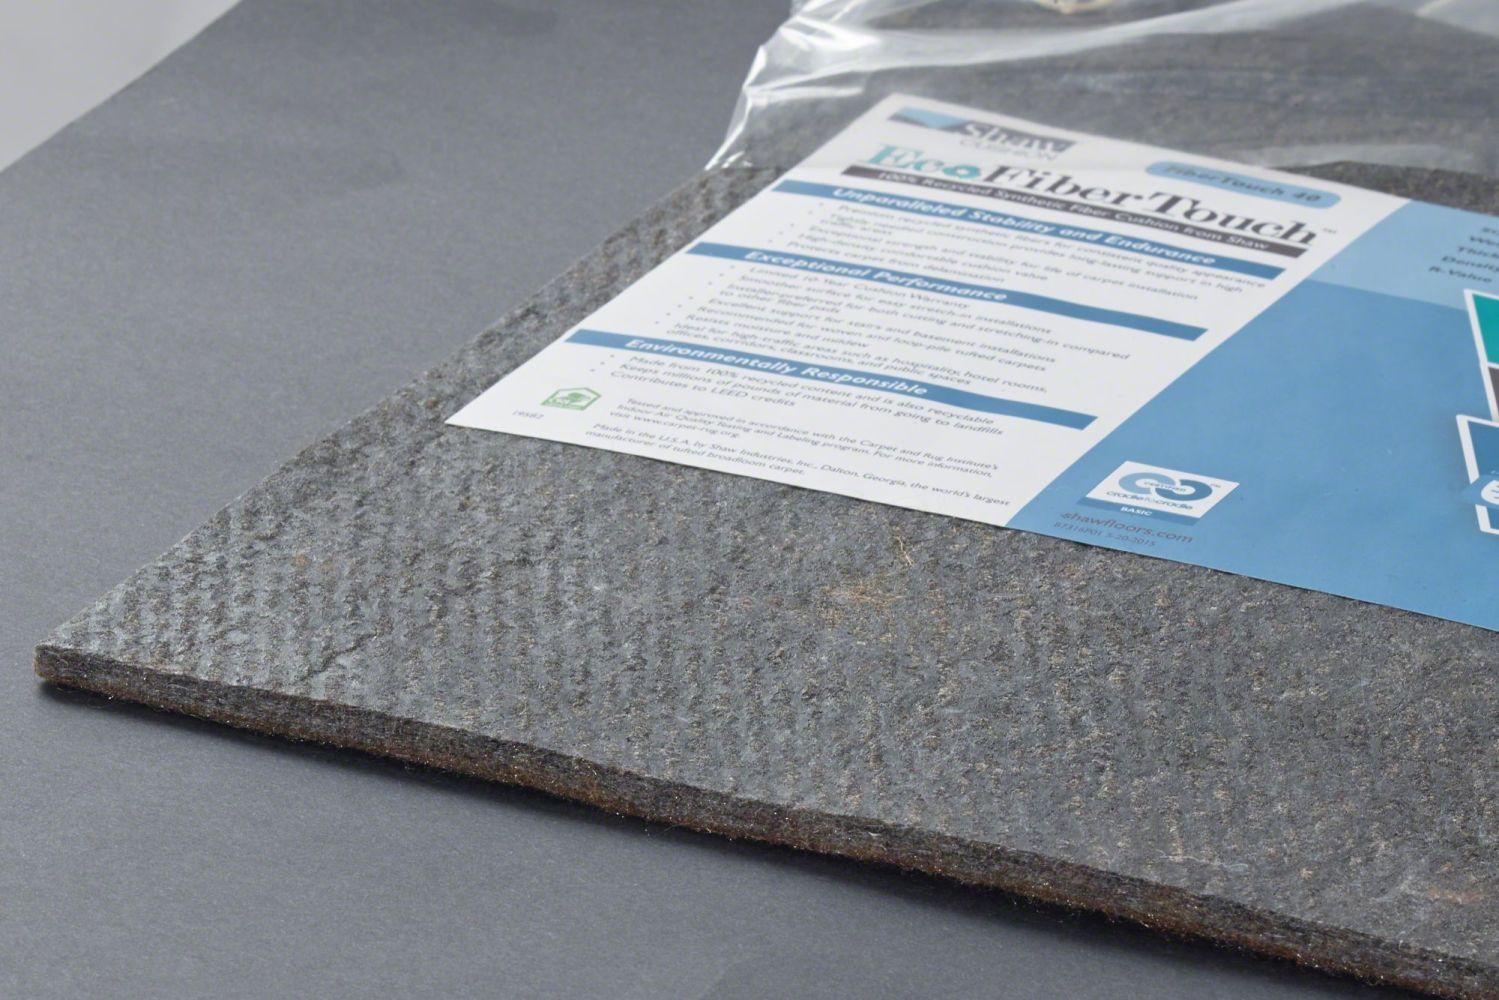 Shaw Floors Eco Edge Cushion Div3fibert40-12 Grey 00001_518PD